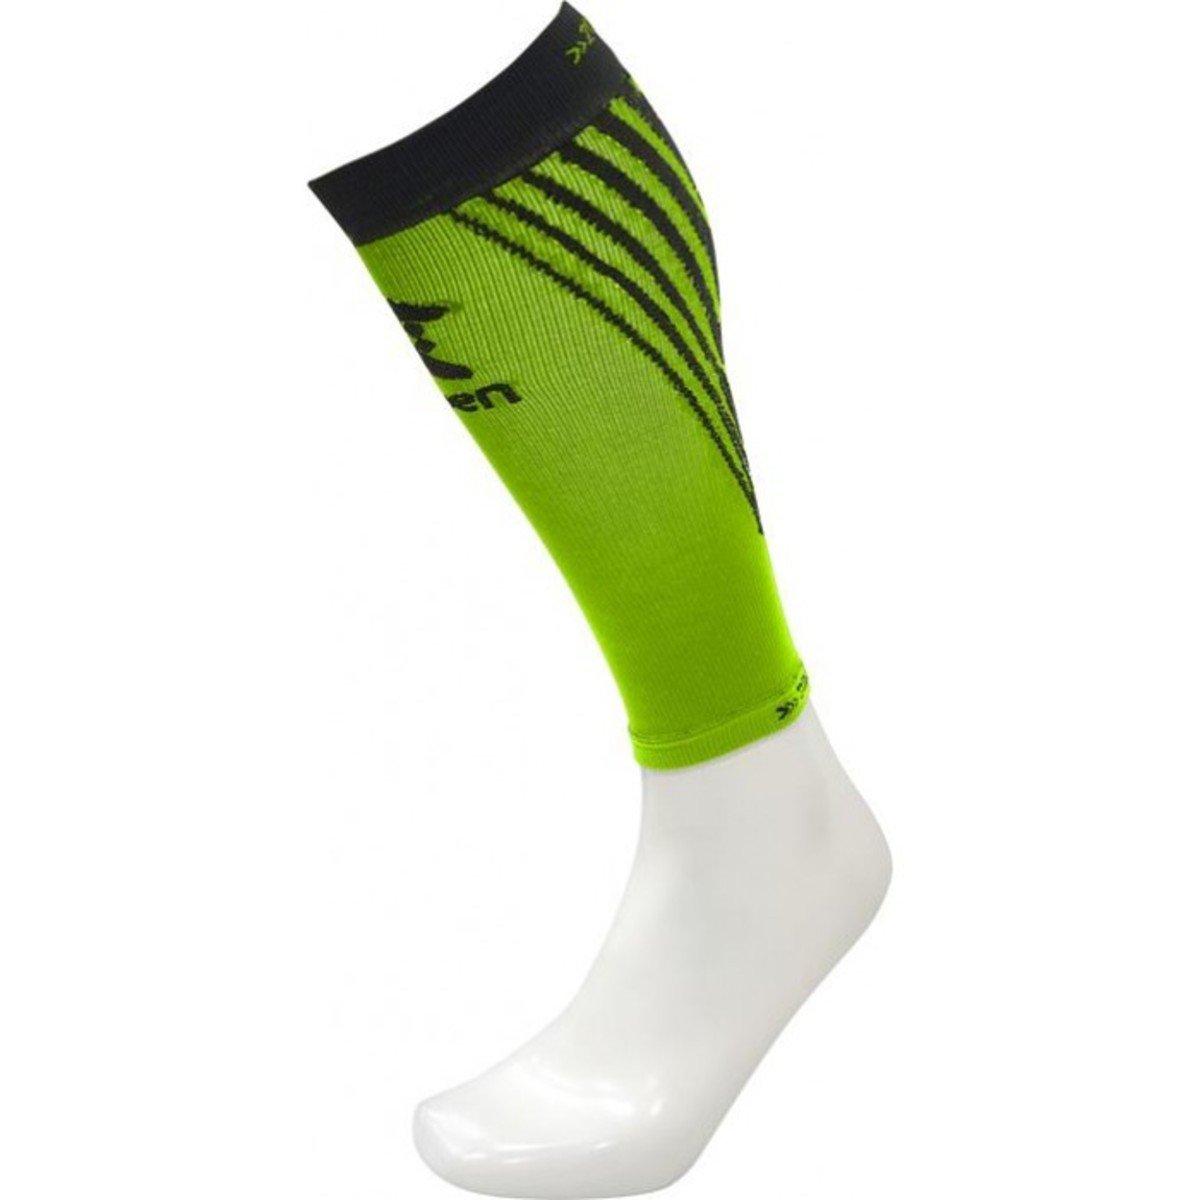 西班牙跑步壓力腳套 Men's Compression Calf Sleeve, Bright Green/Black M